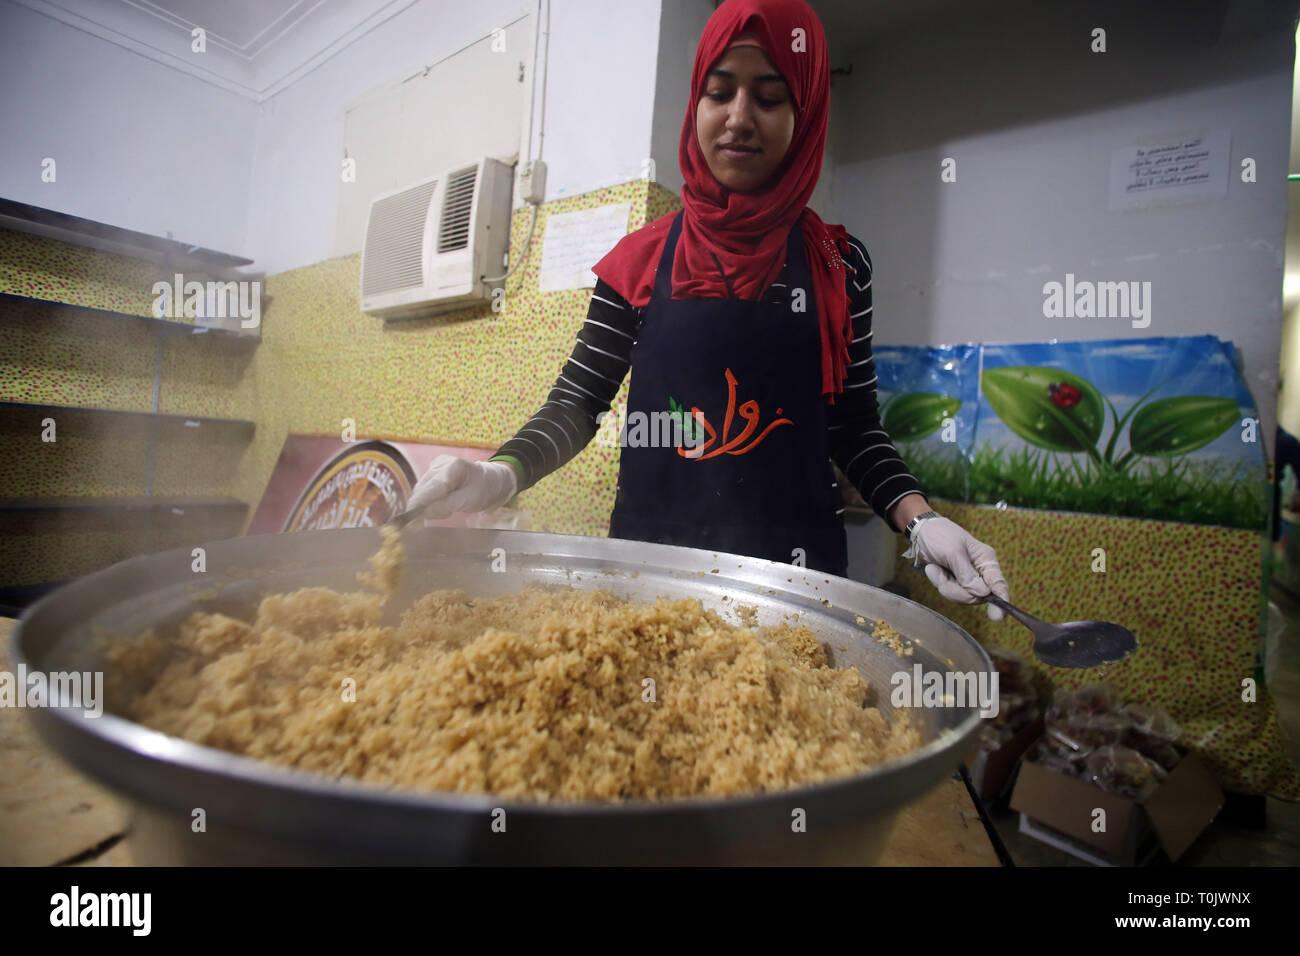 Sharqiya Egypt 20th Mar 2019 A Woman Prepares Food In A Charity Kitchen In Sharqiya Province